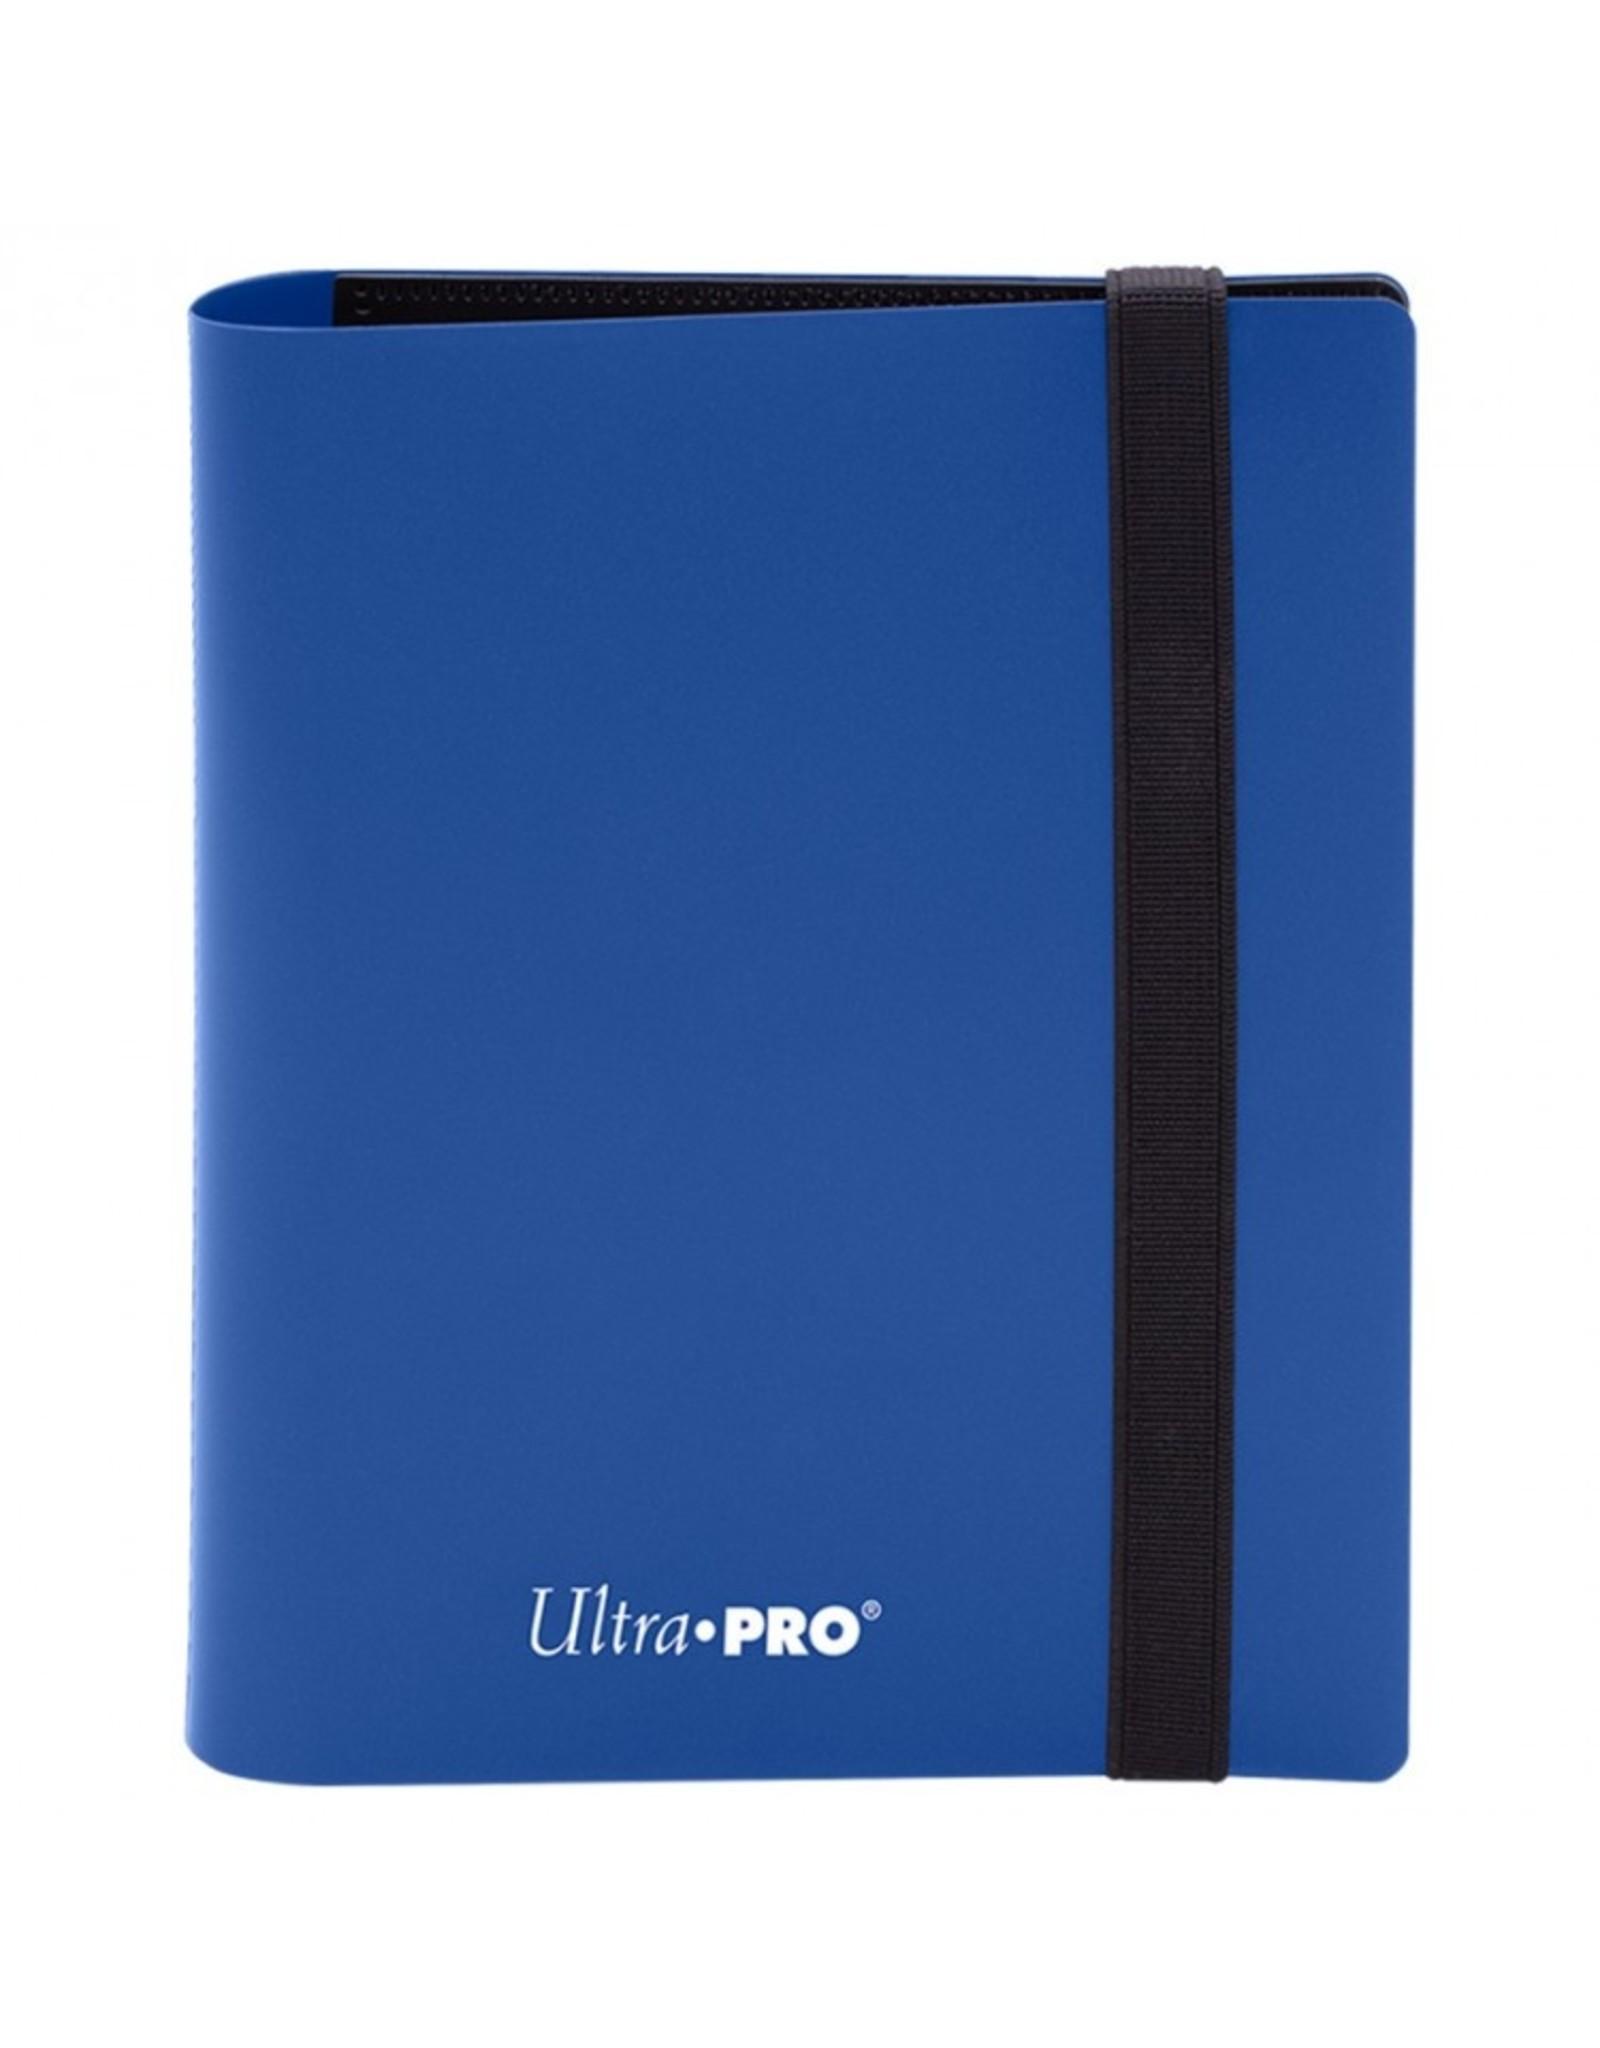 Ultra Pro Binder: 4pkt: PRO: Eclipse: Pacific BU